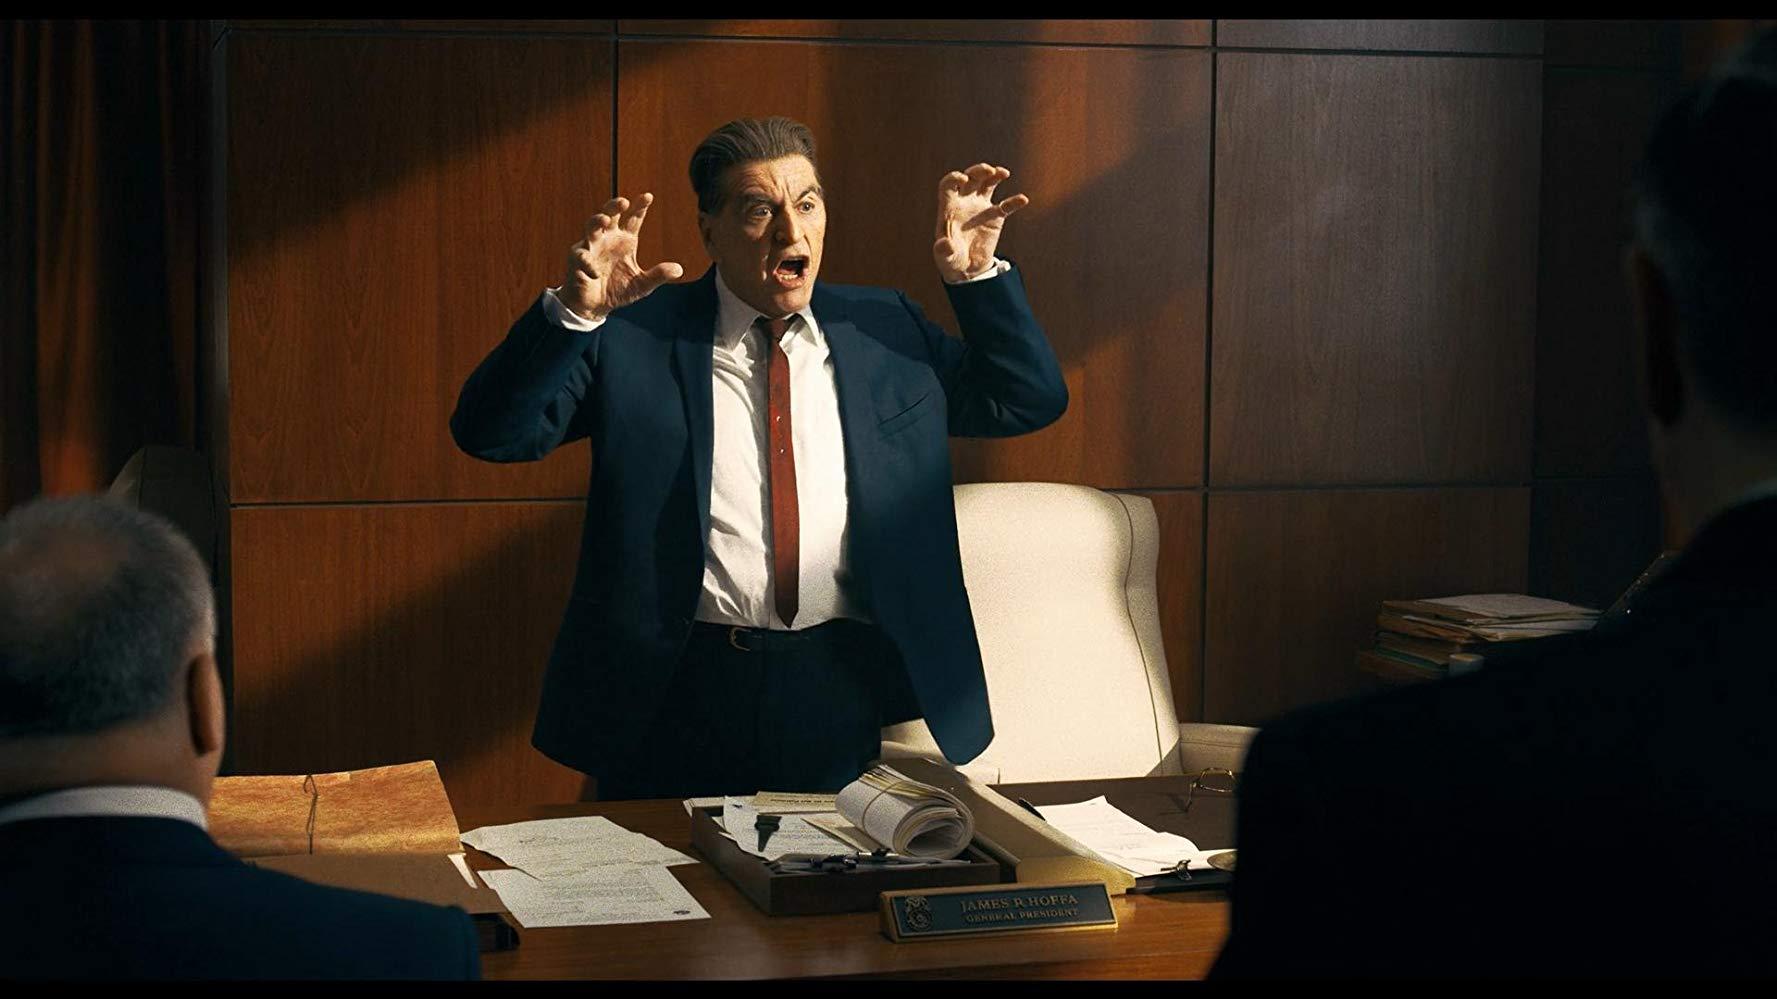 Hollywood Insider's Review Al Pacino, Martin Scorsese, Robert De Niro, Joe Pesci, The Irishman, Netflix